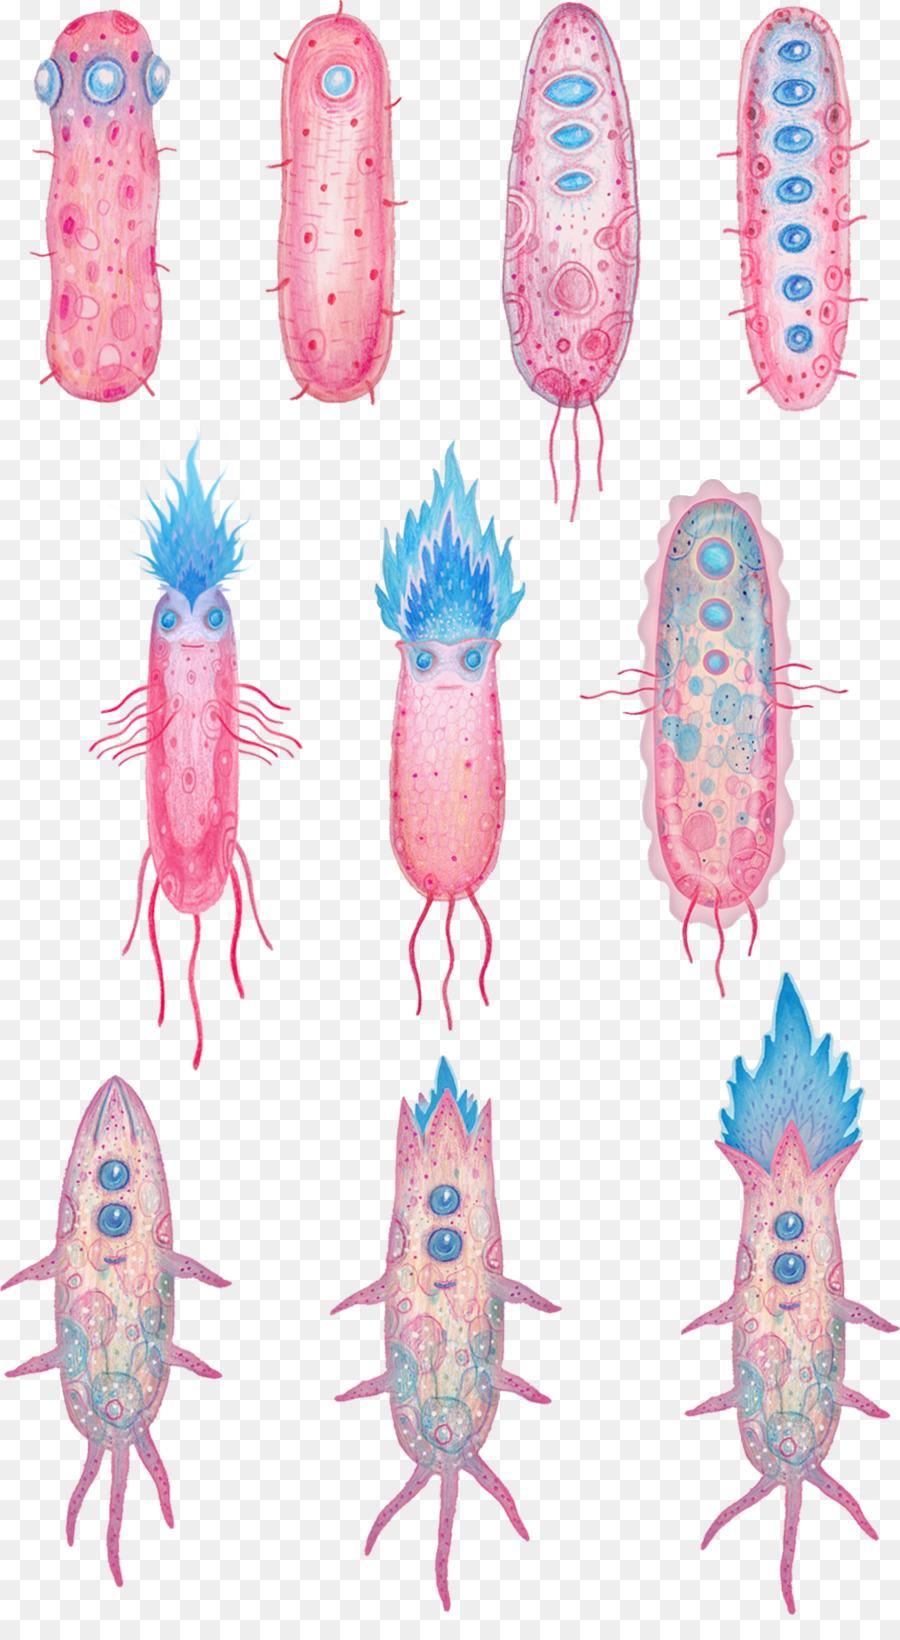 Bacteria clipart biology. Animation cartoon clip art